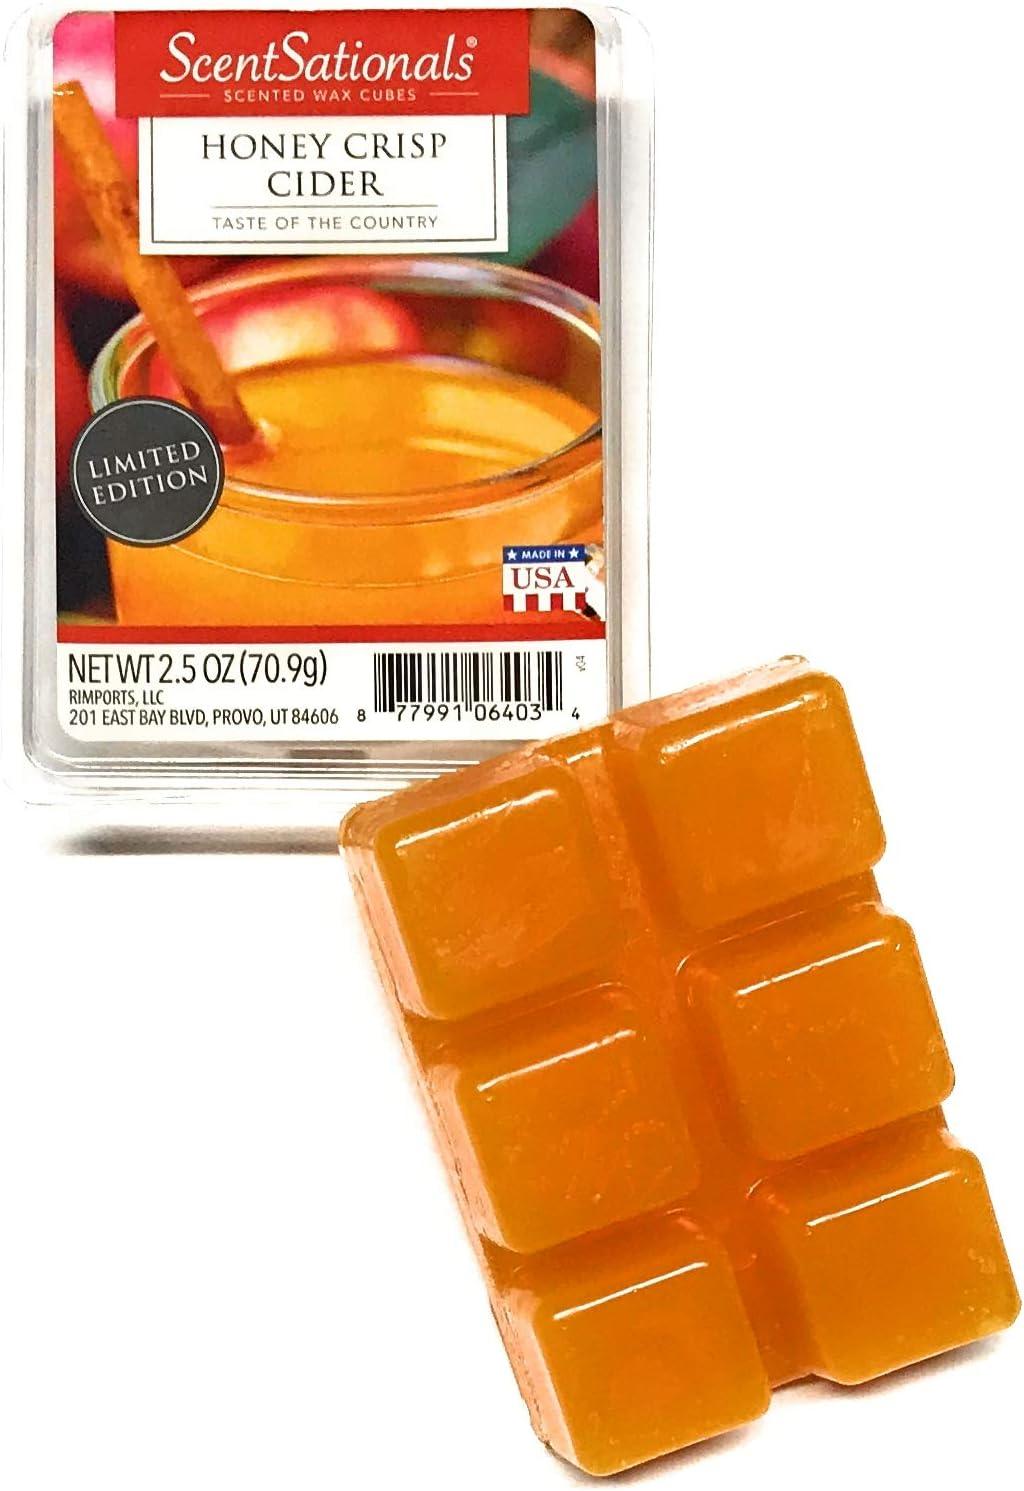 ScentSationals Honey Crisp Cider Wax Cubes - 2017 Limited Edition